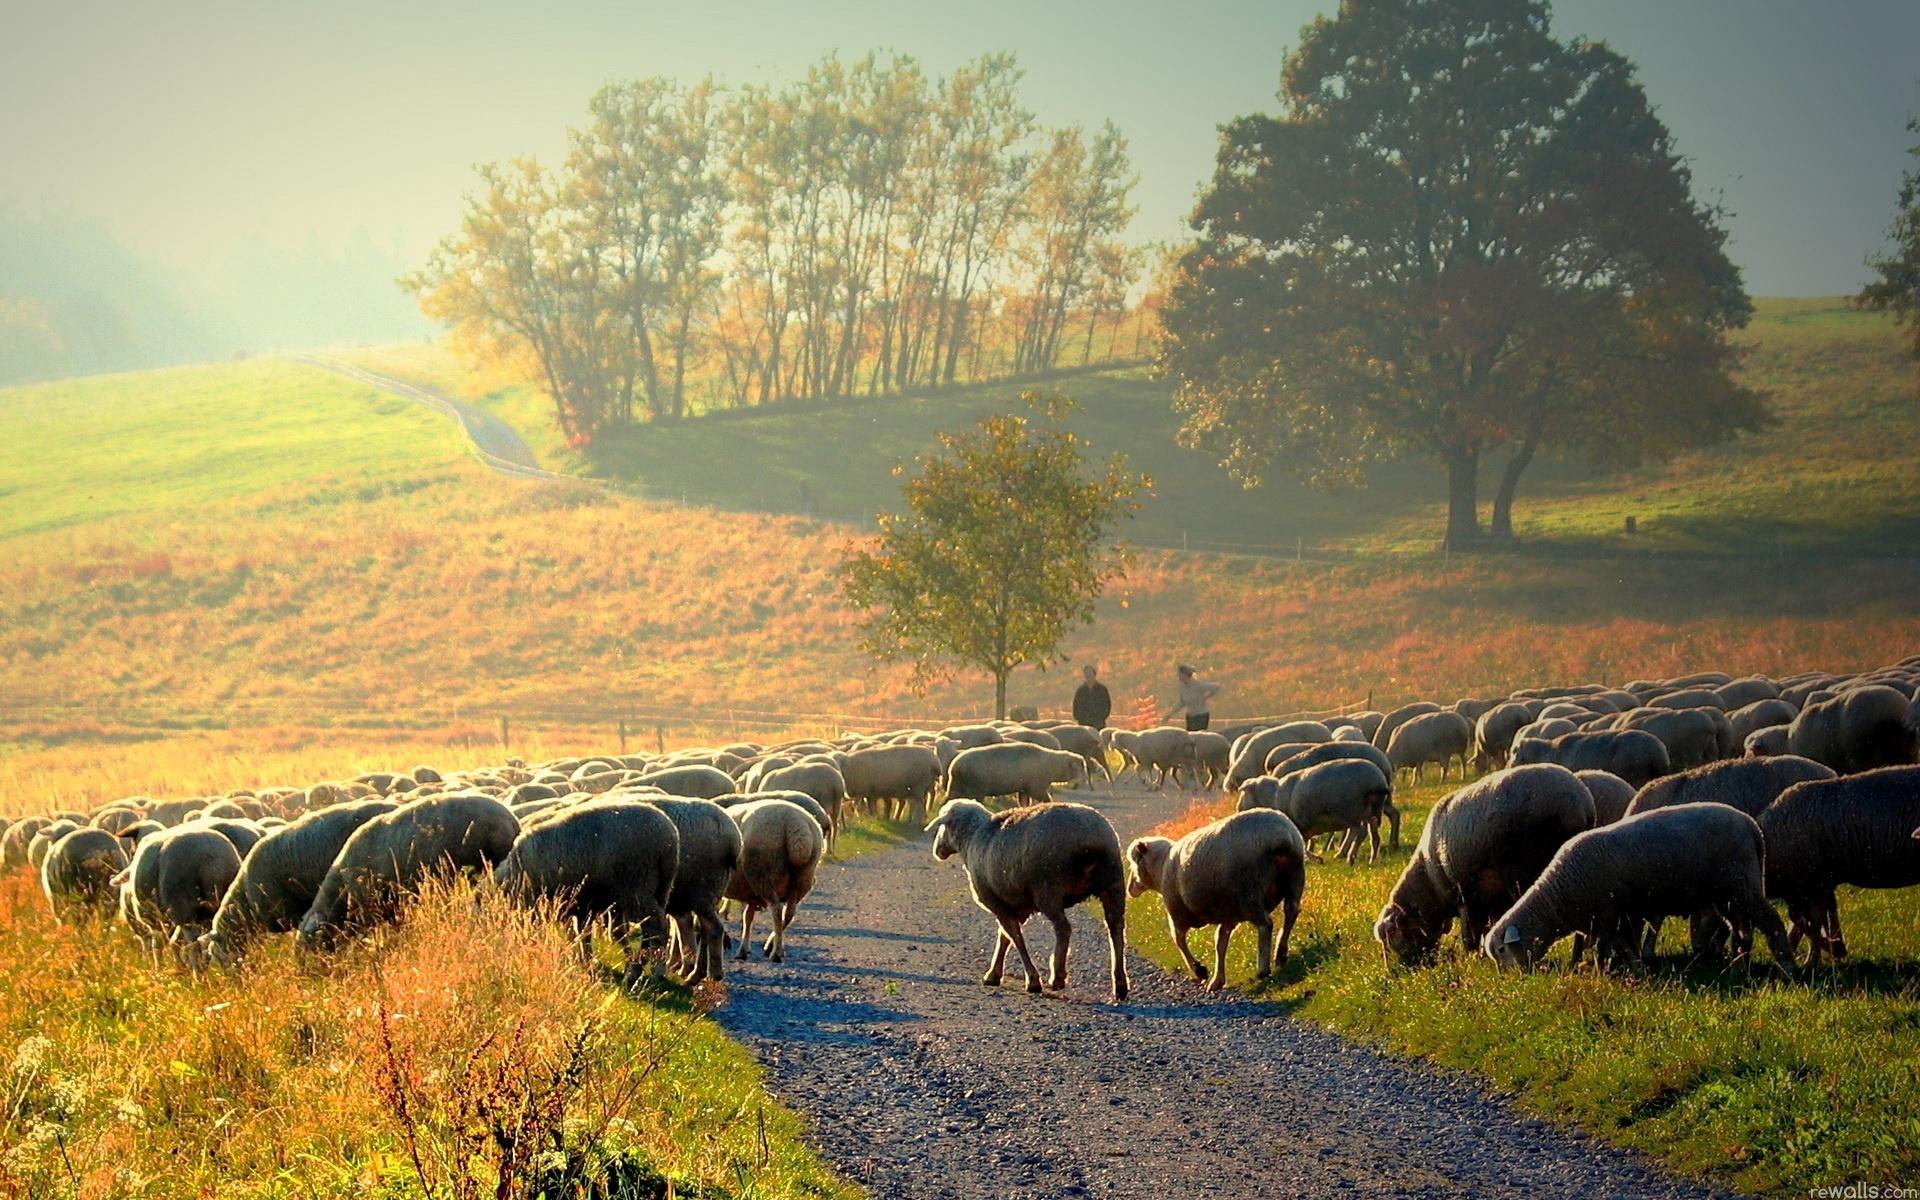 Sheep Wallpaper Morning Nature Landscape Desktop